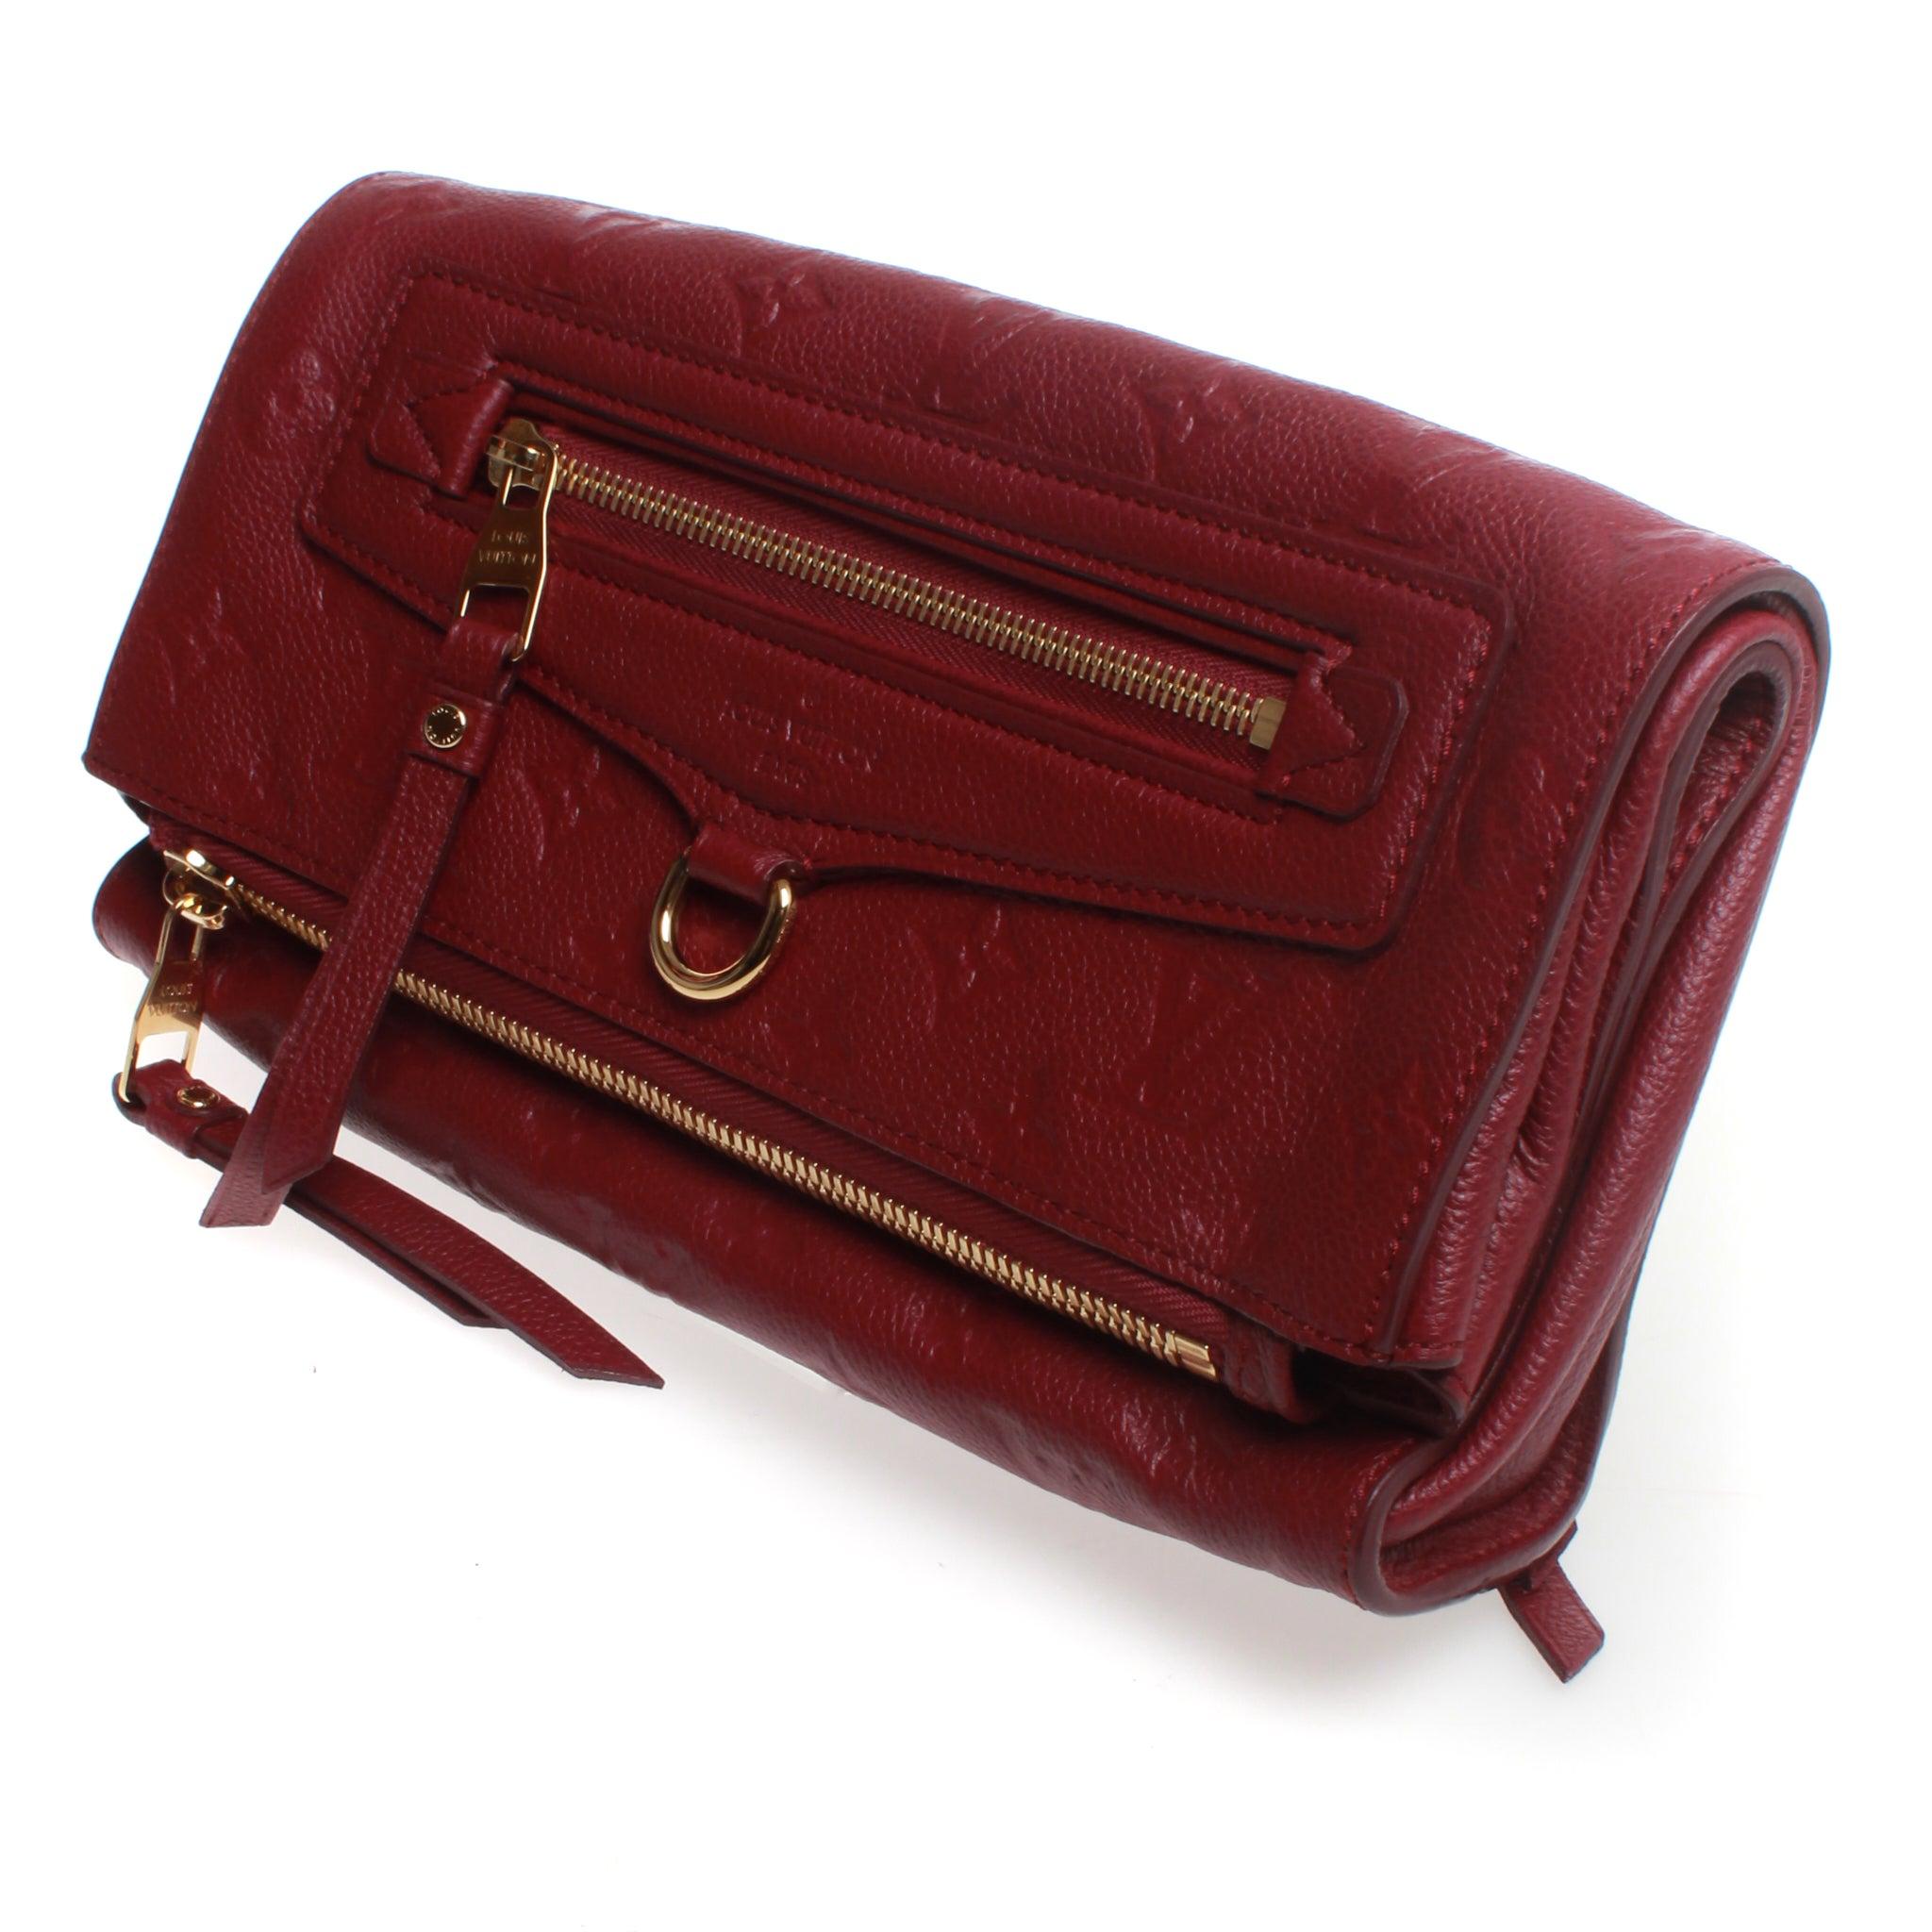 ad5b3fcff161 Louis Vuitton Logo print petillante Clutch Bag at 1stdibs